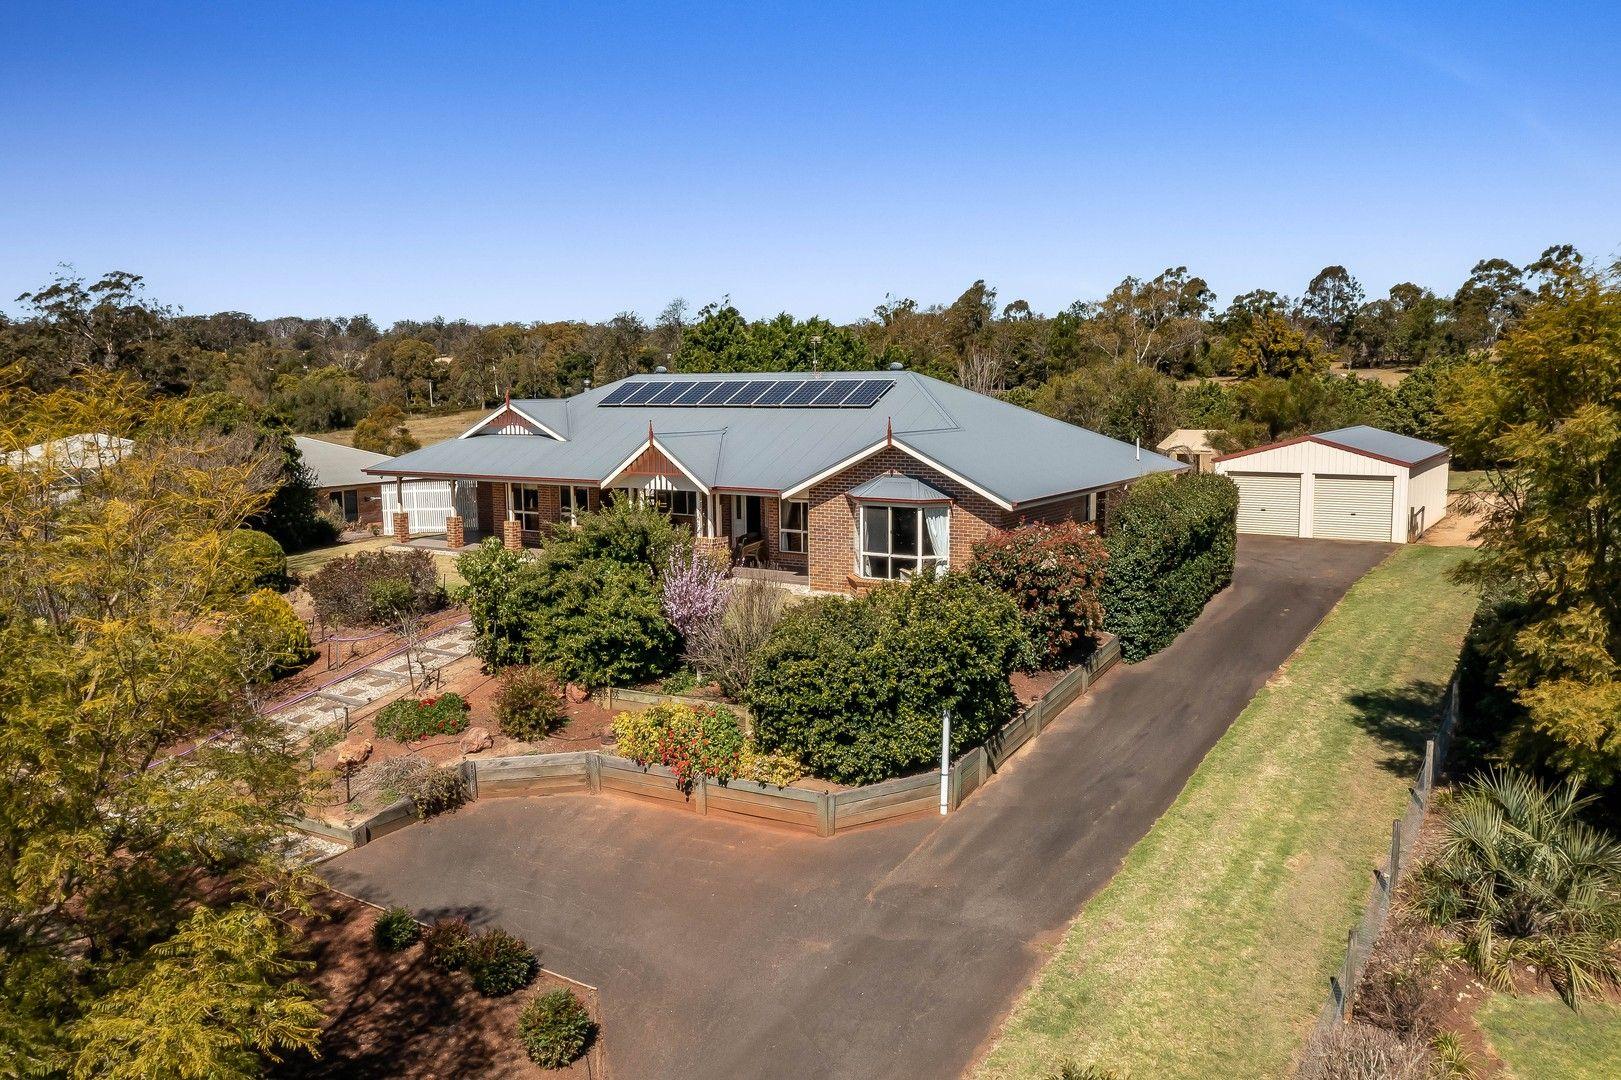 27 Charmaine Court, Kleinton QLD 4352, Image 0